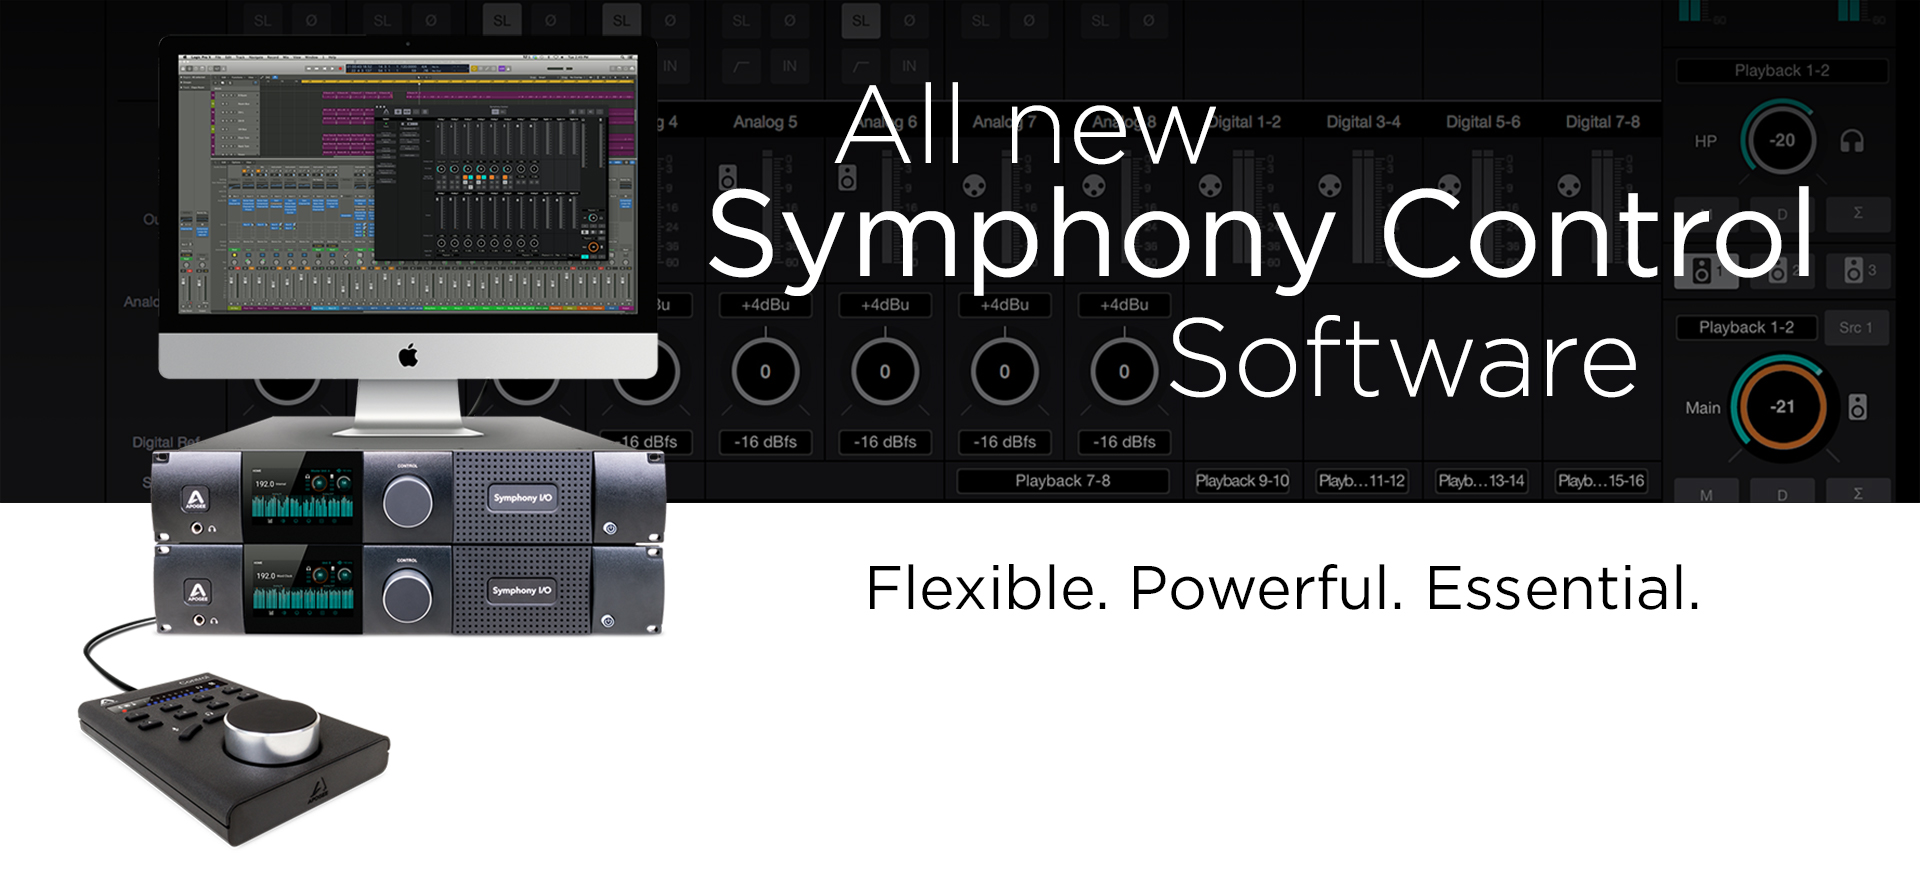 Symphony Control Software